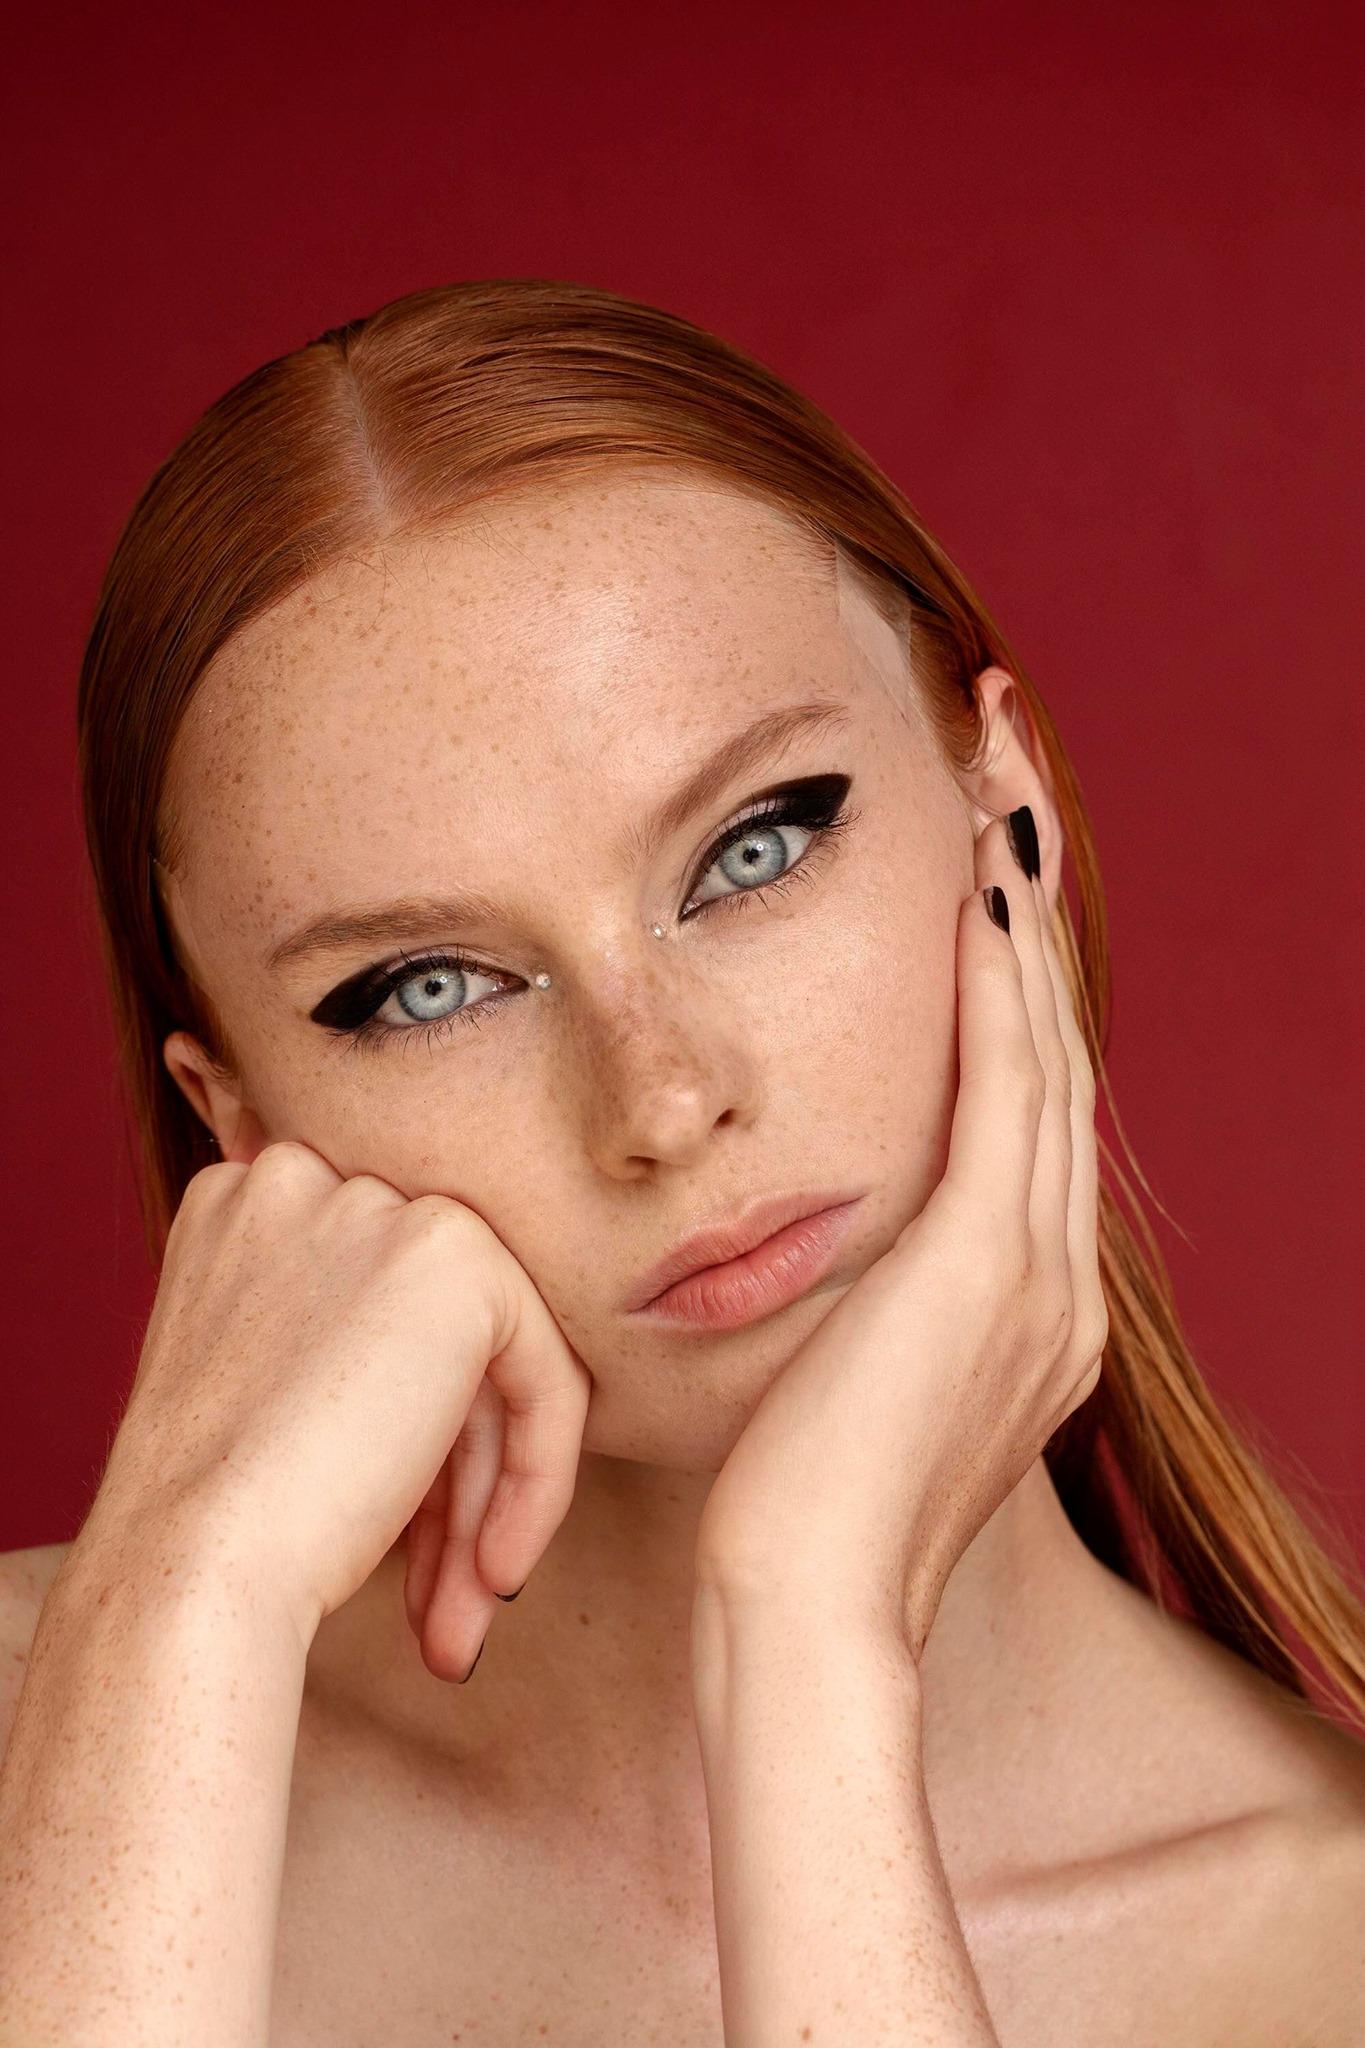 Karin van berkel nena visagie beauty